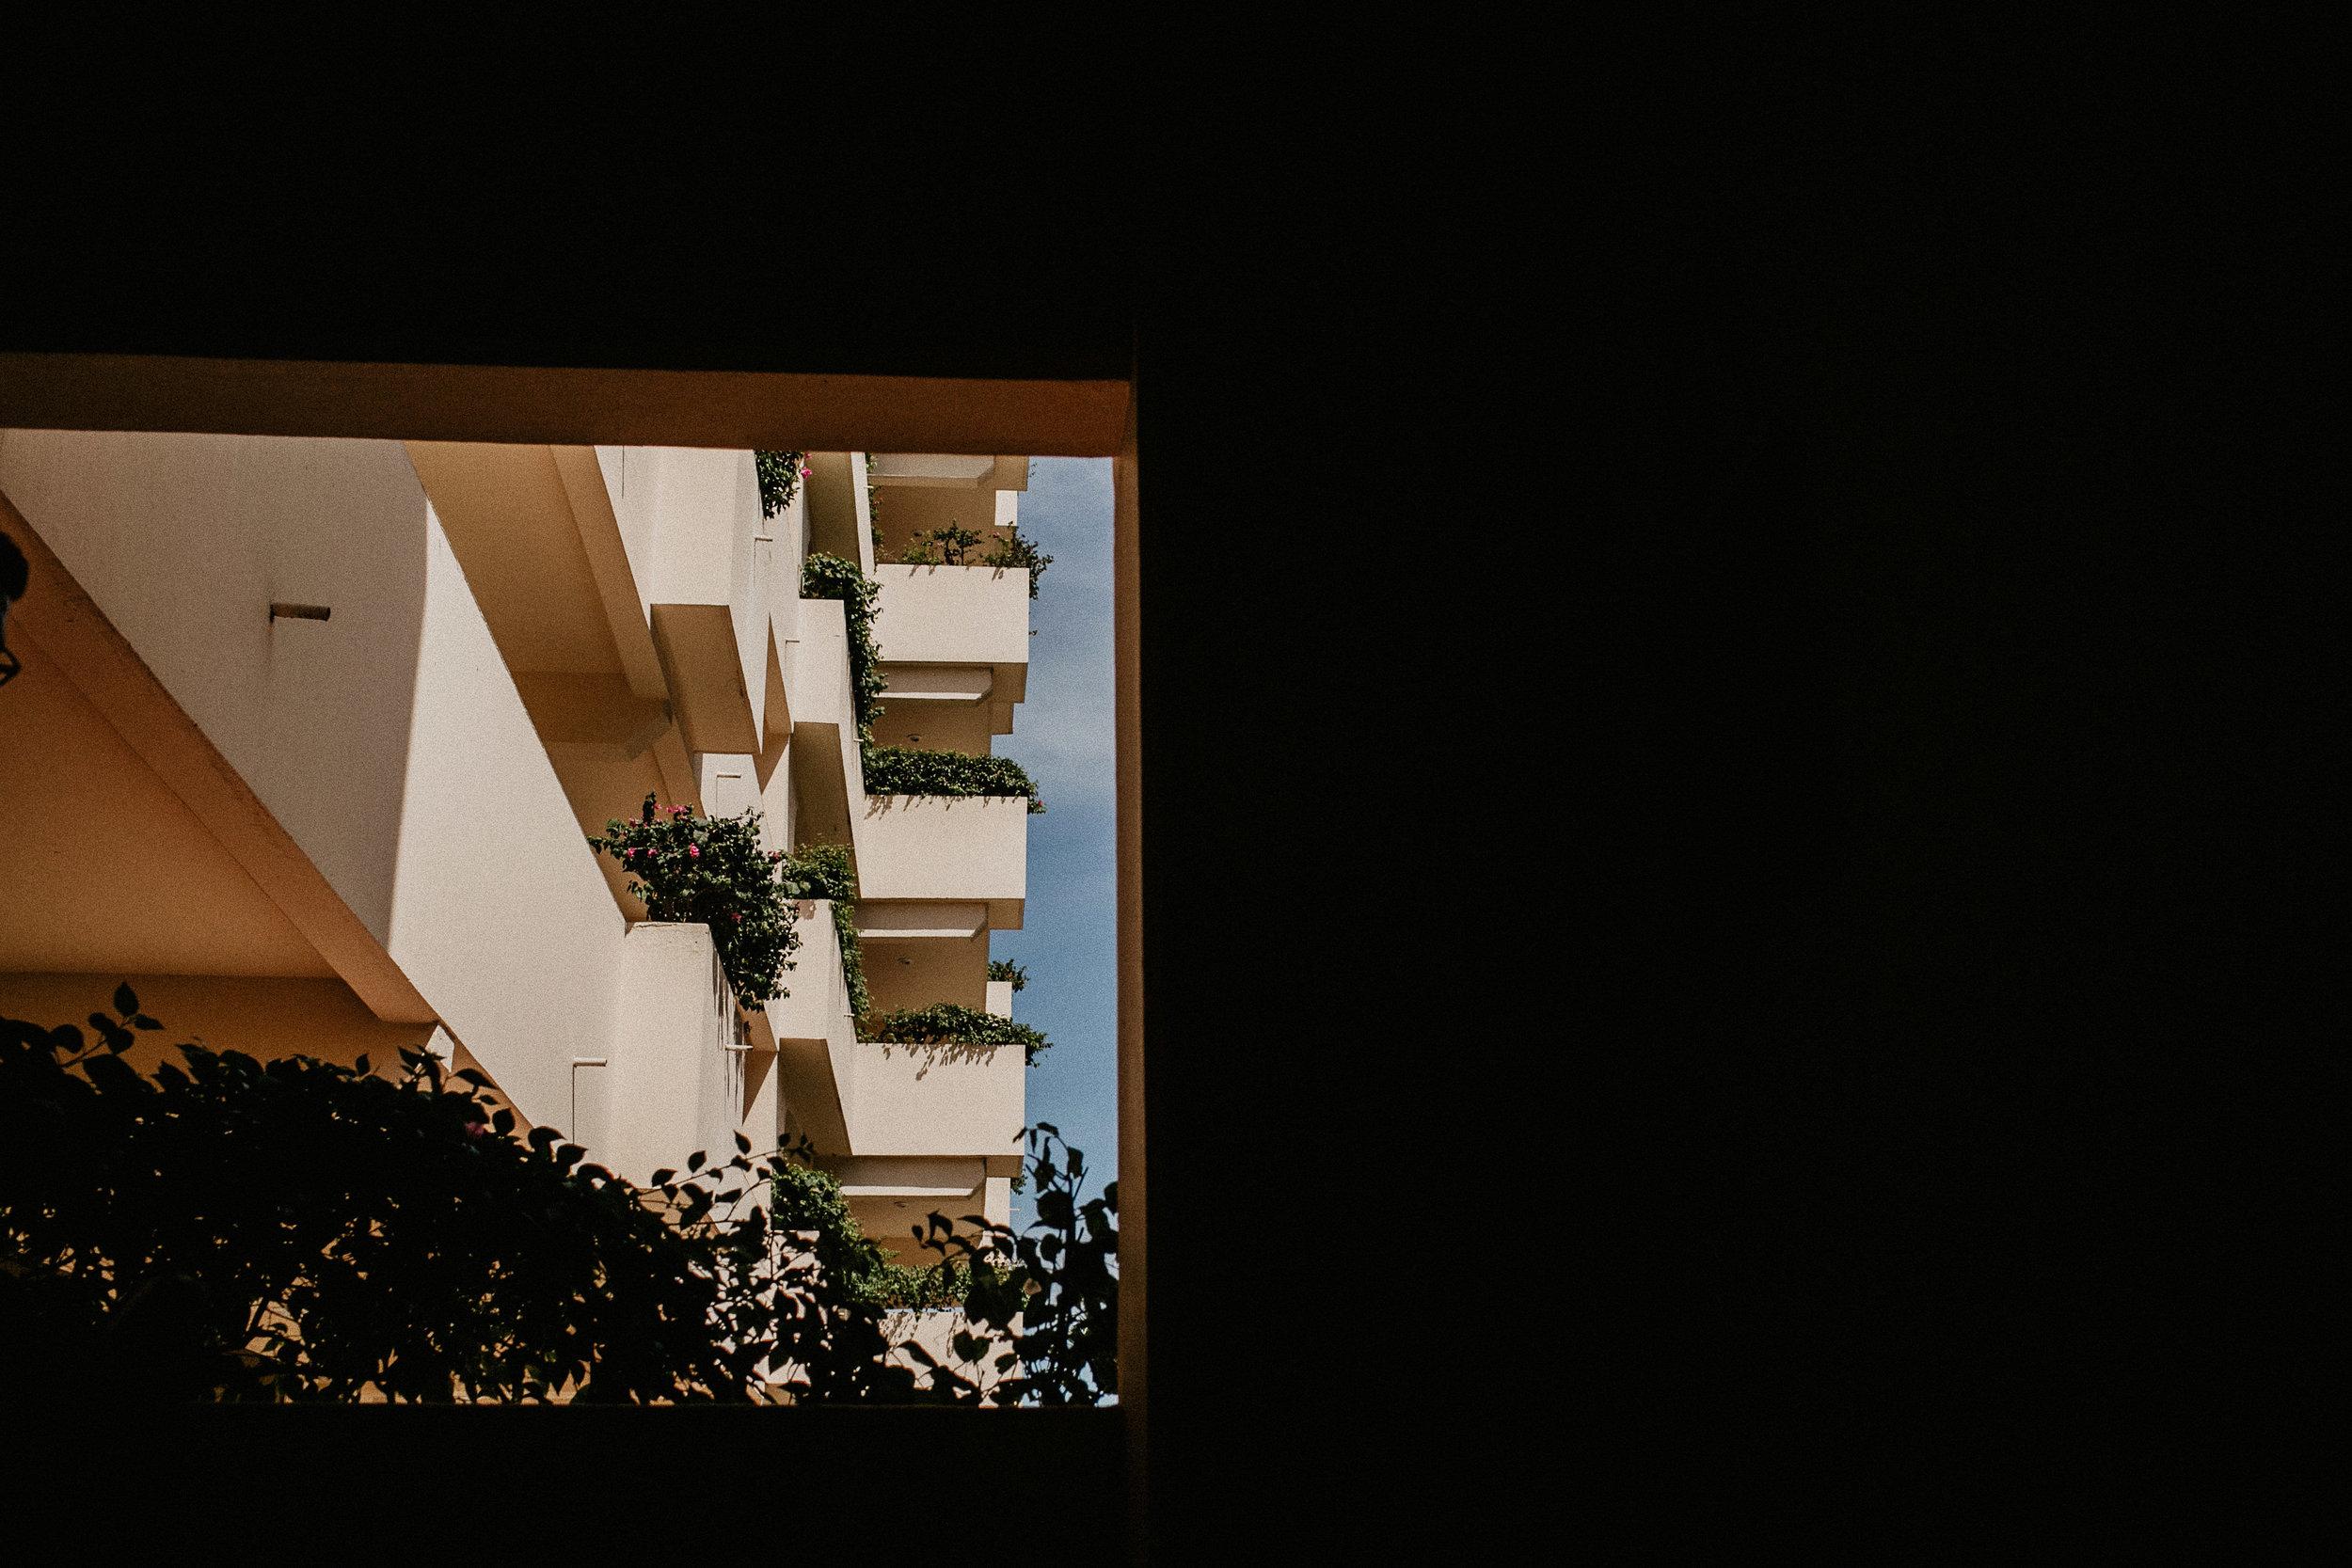 alfonso_flores_destination_wedding_photography_puerto_vallarta_hotel_barcelo_vallarta_cuttler_amela-78.JPG